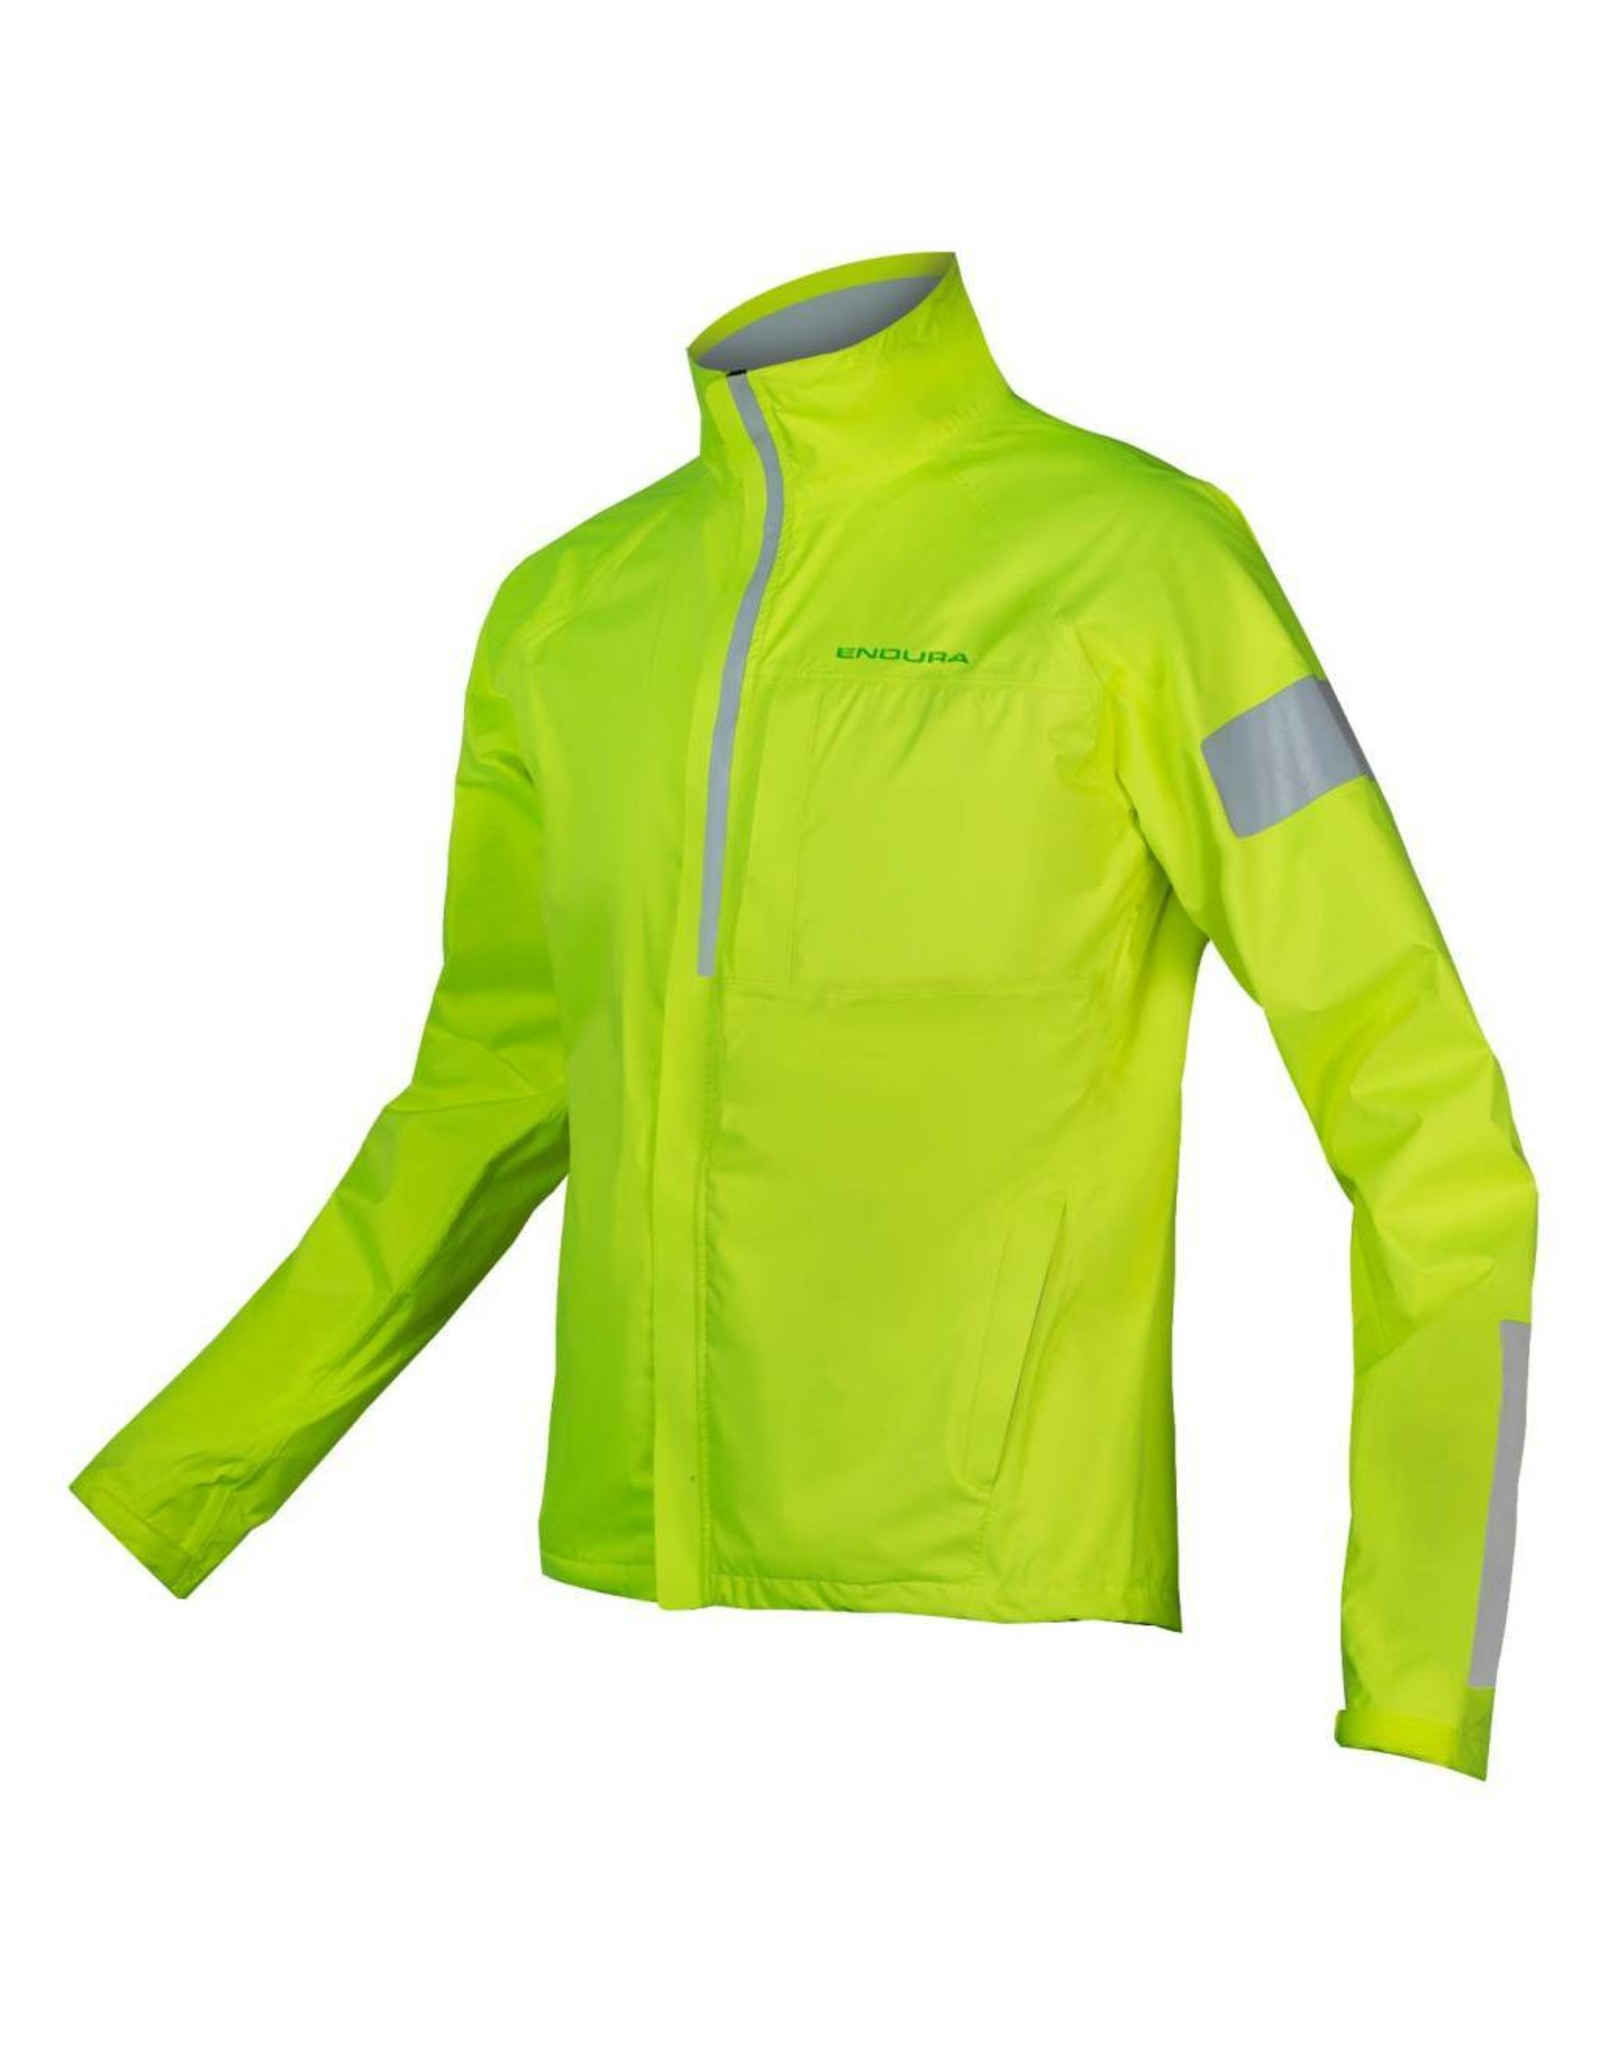 ENDURA Endura Urban Luminite Jacket - High Vis Yellow